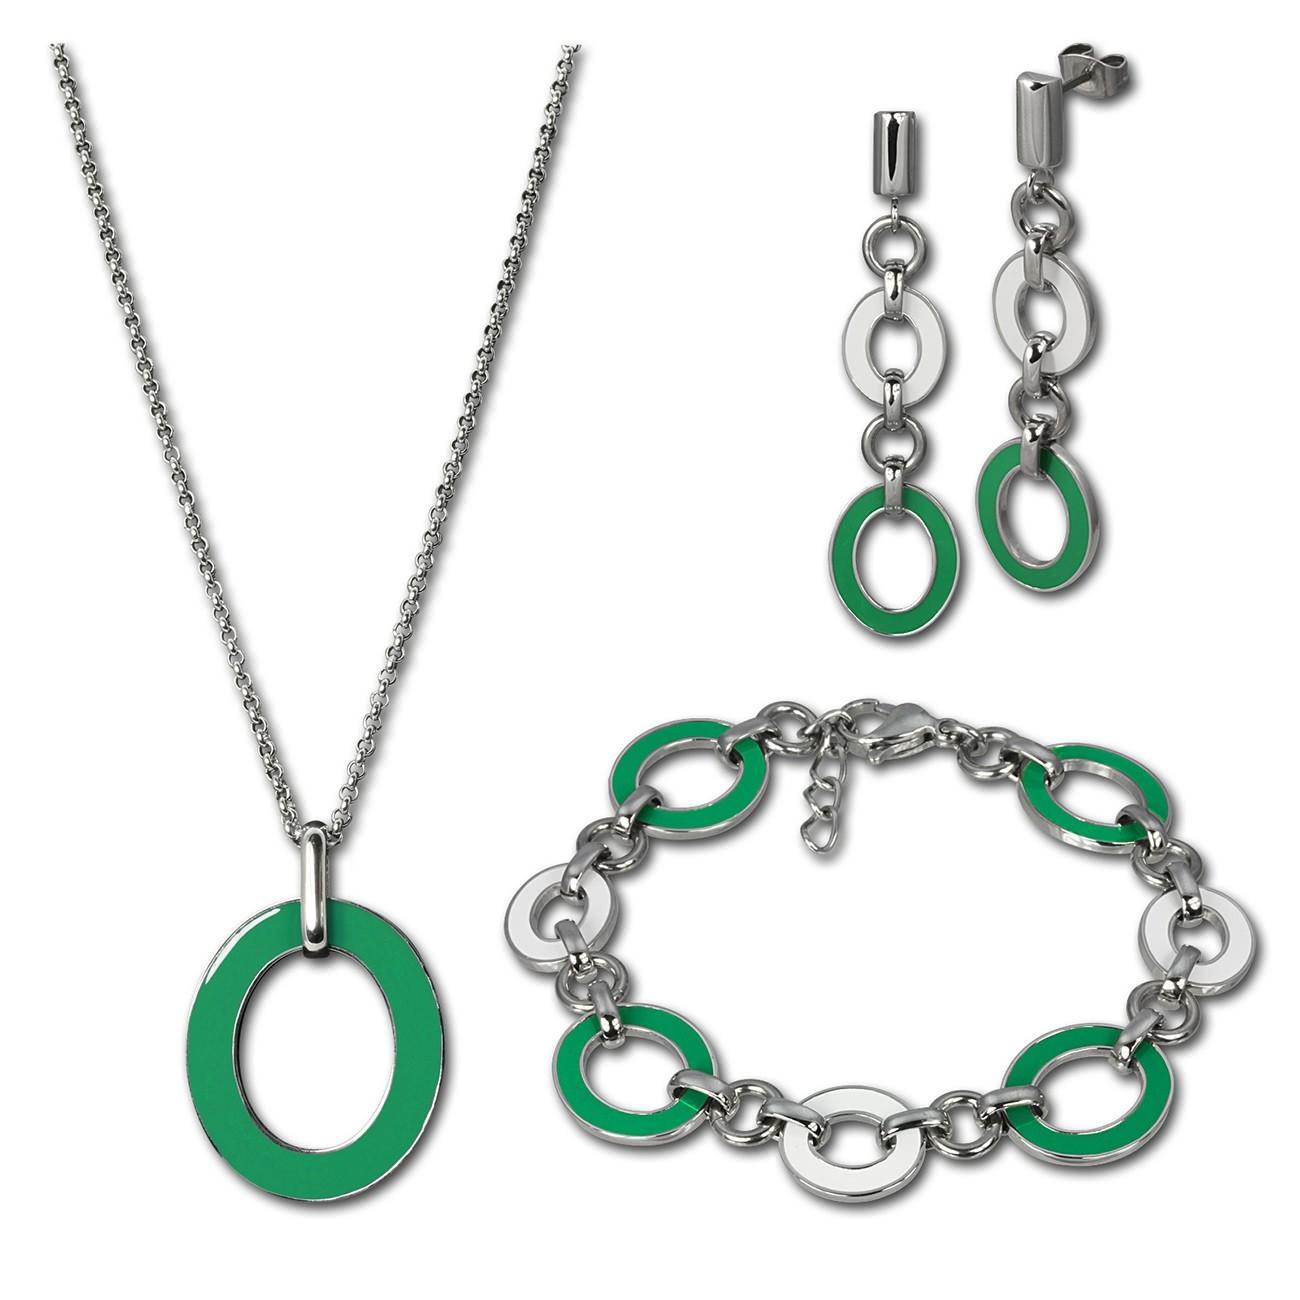 Amello Edelstahlschmuckset Emaille grün Kette, Armband, Ohrringe ESSG01G